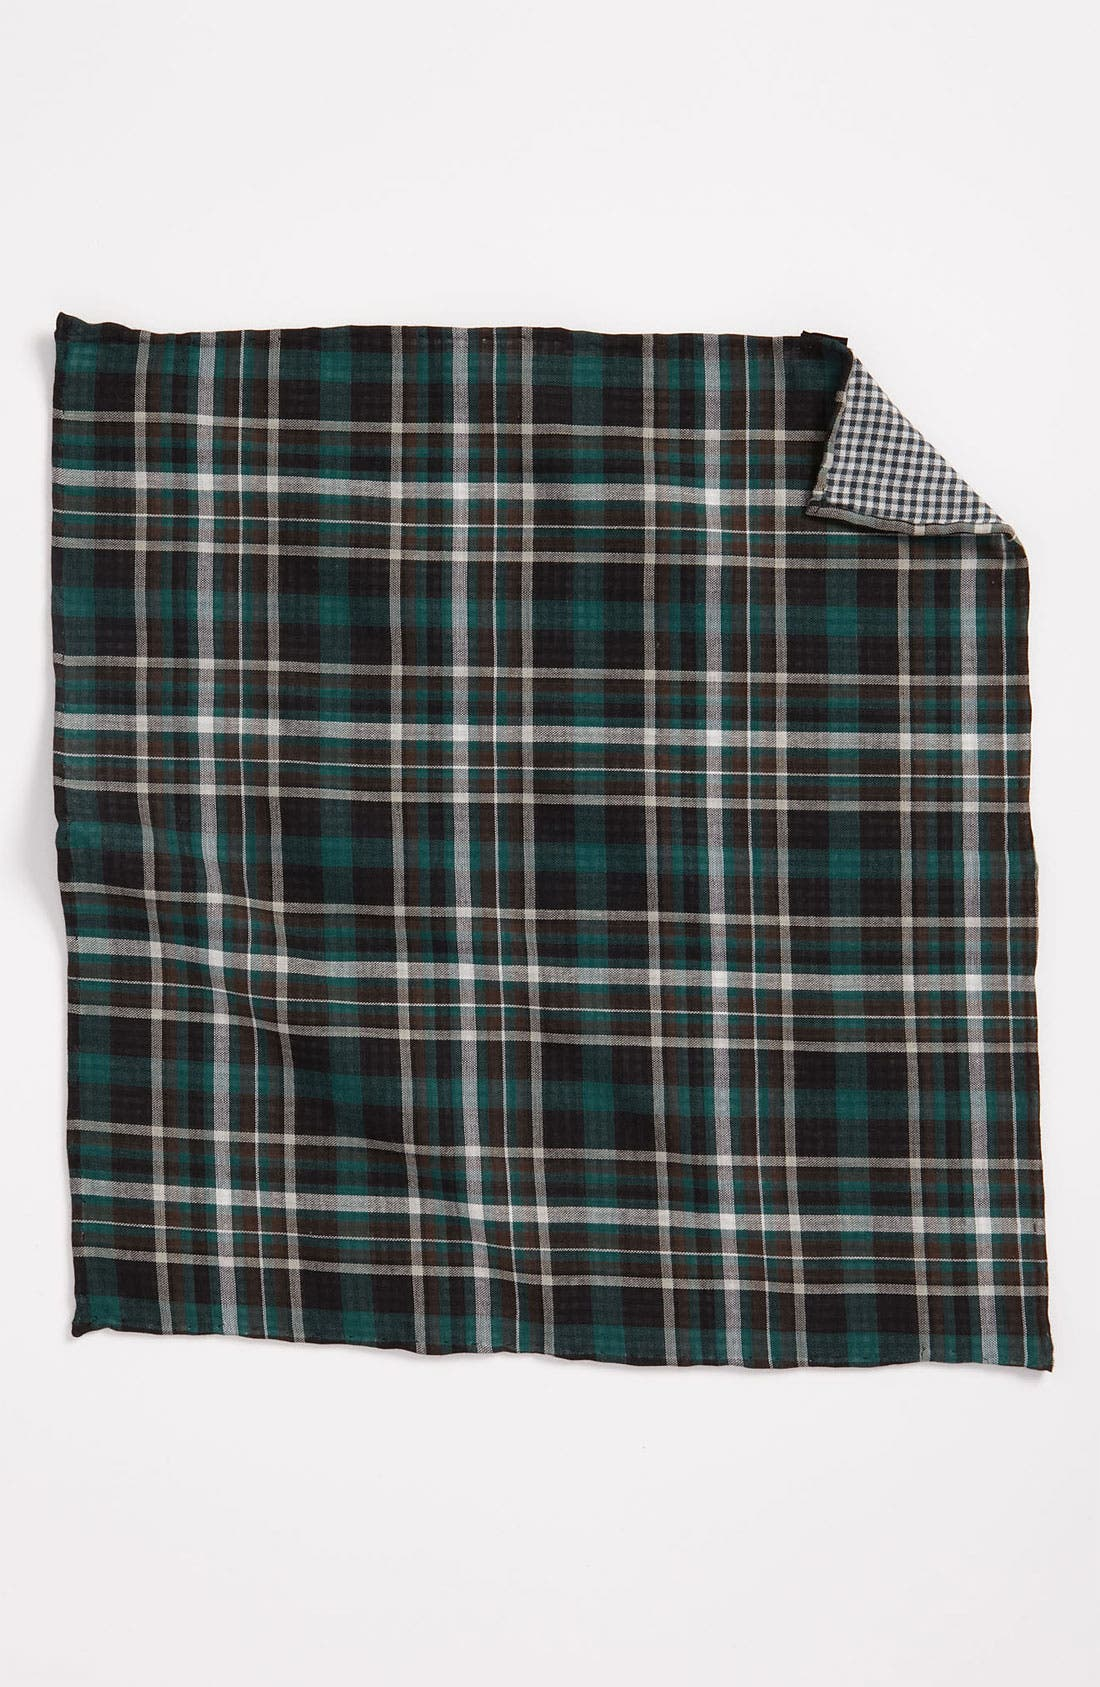 Alternate Image 3  - The Tie Bar Plaid Cotton Flannel Pocket Square